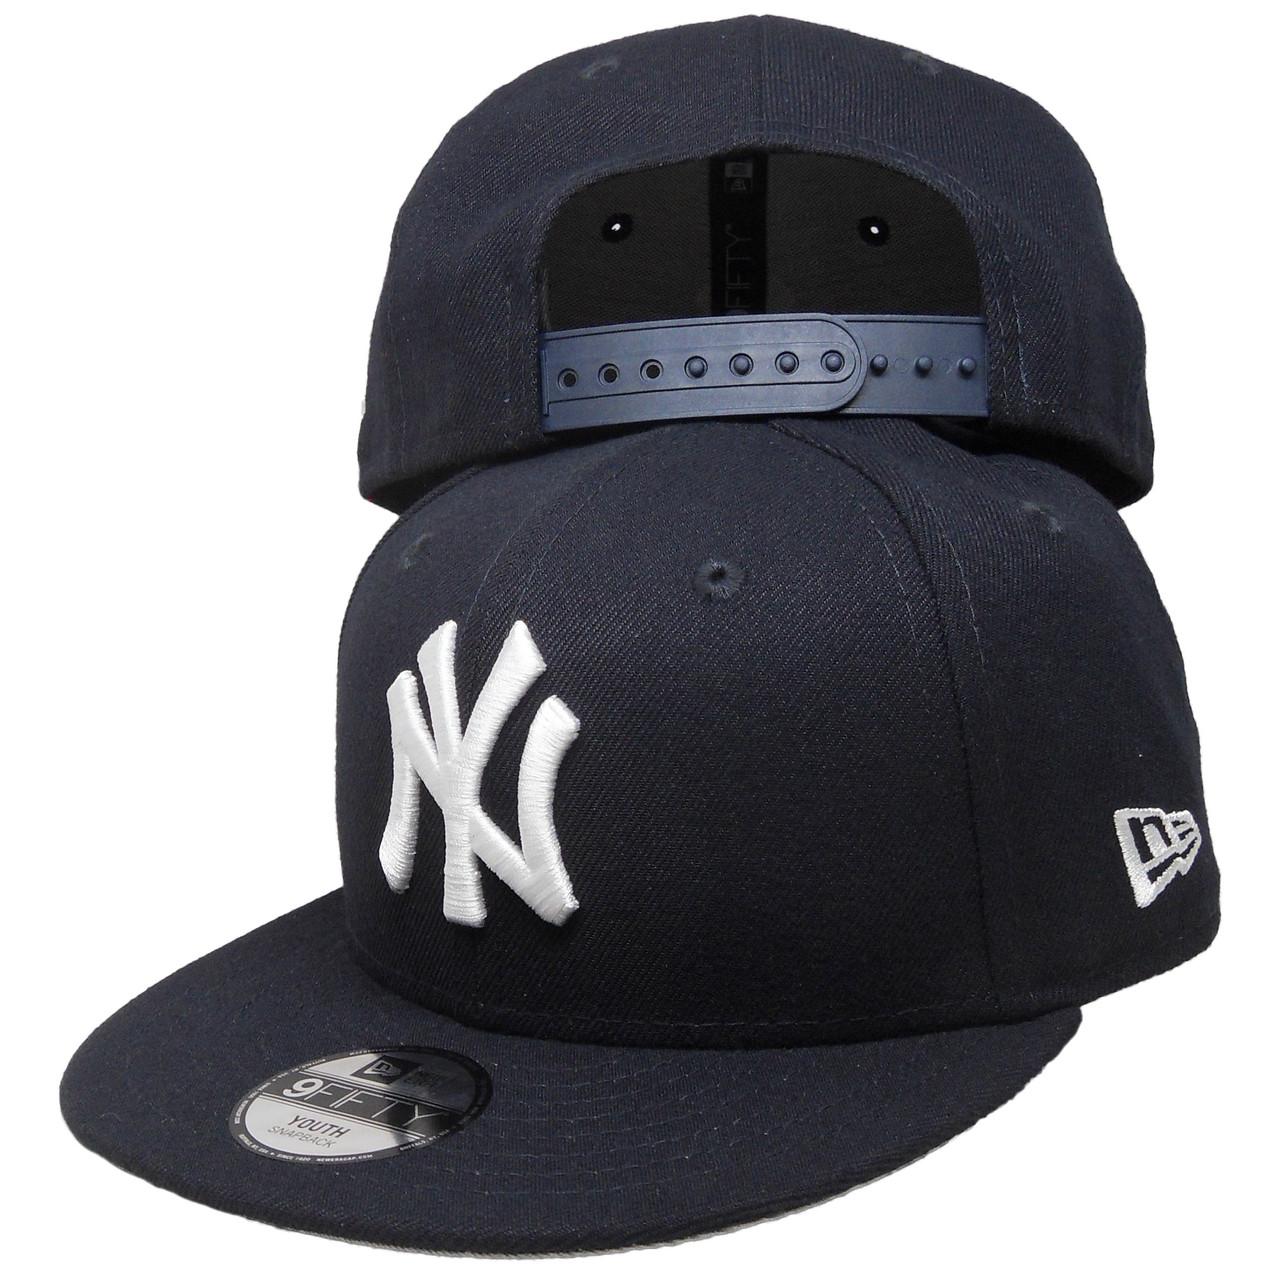 New York Yankees New Era Basic 9Fifty Kids Snapback Hat - Navy ... 59e794bfbc18